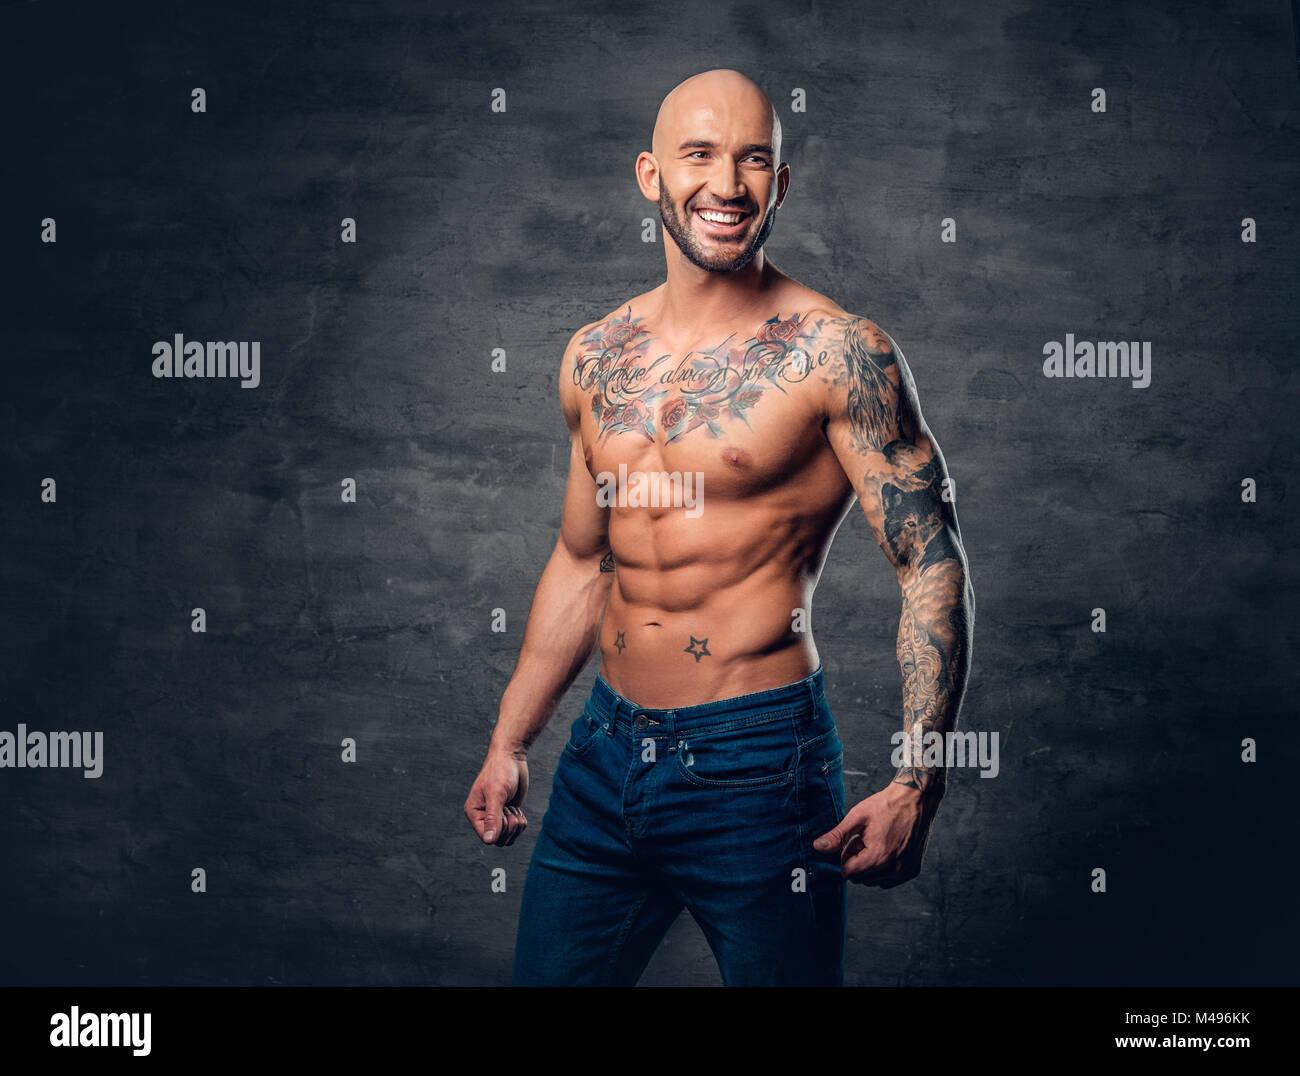 Männer mit tattoos muskulöse Tattoos bei